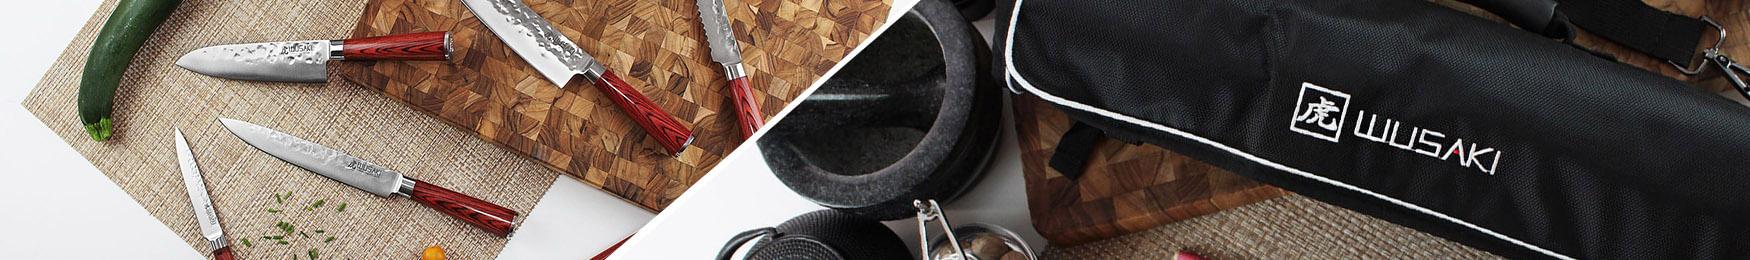 Mallette Wusaki Pakka X50 Pakkawood 5 couteaux